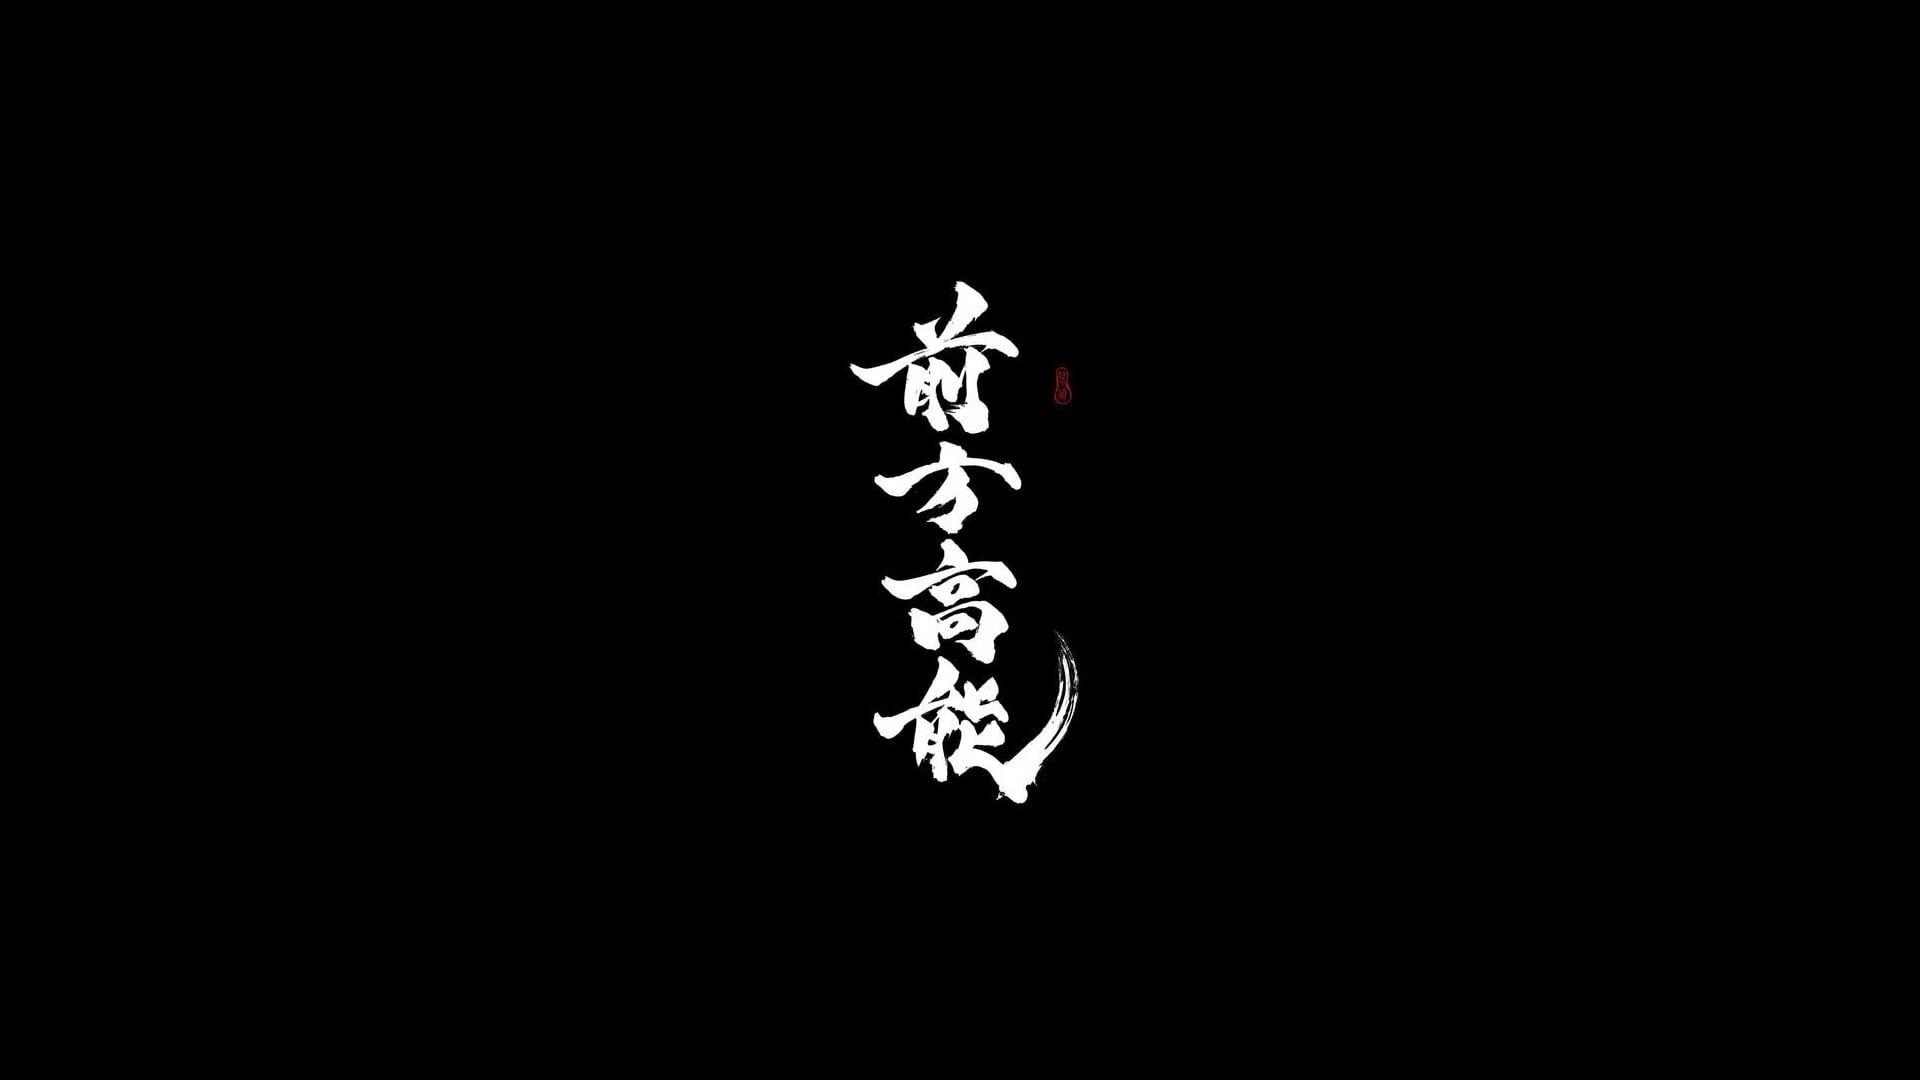 Minimalism Japanese Characters Kanji Black White Japan 1080p Wallpaper Hdwallpaper Desktop Wallpaper Japanese Characters Umbrella Illustration